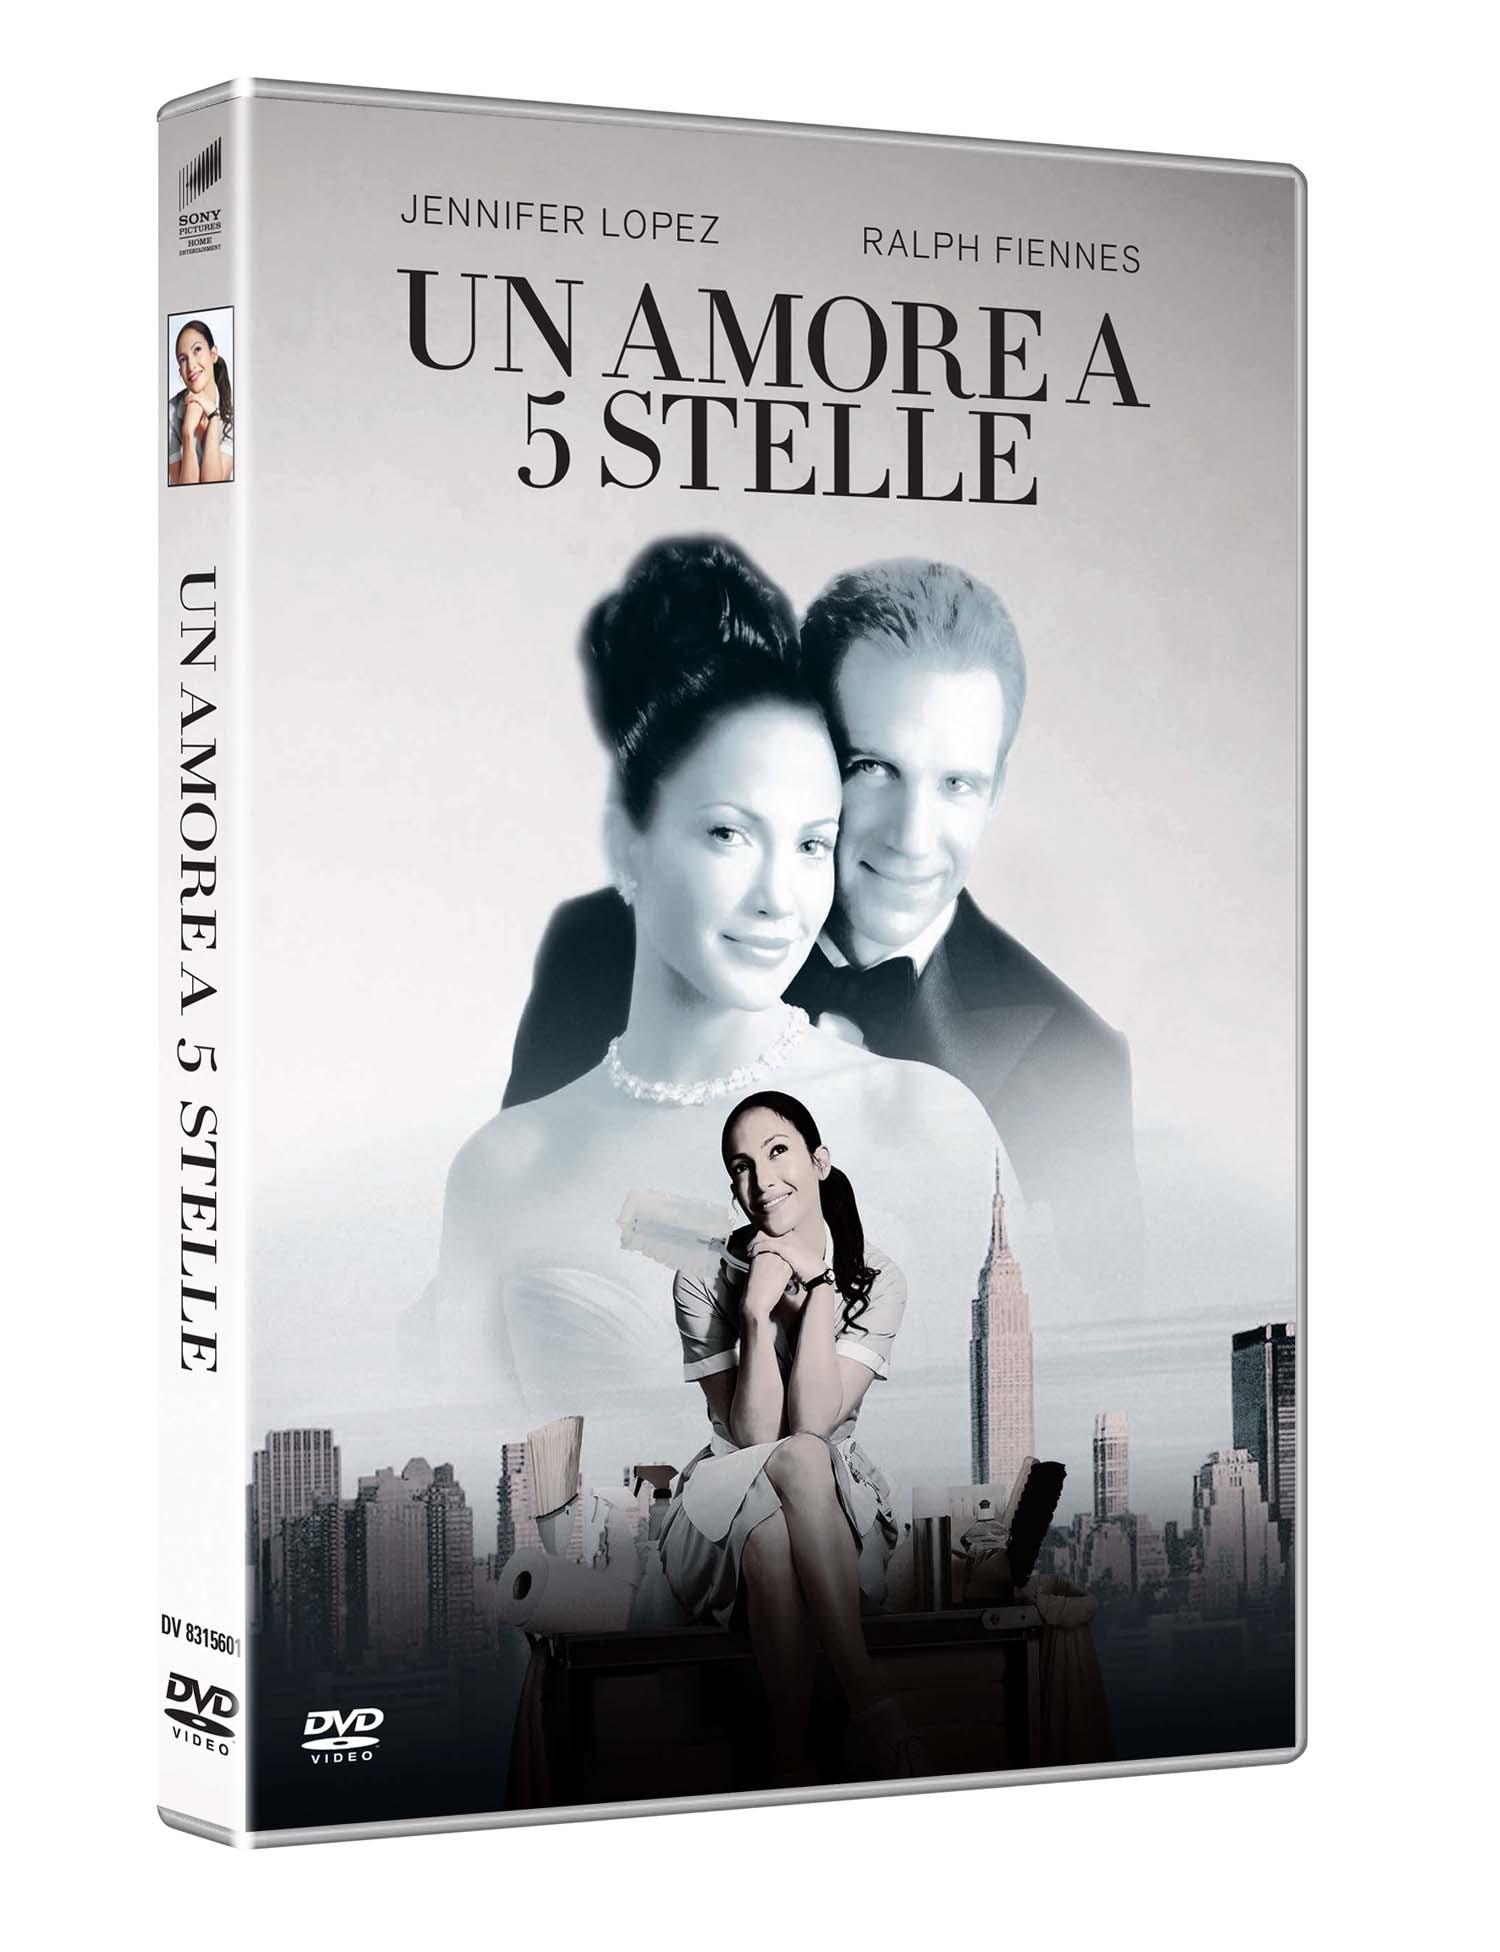 UN AMORE A 5 STELLE (SAN VALENTINO COLLECTION) (DVD)